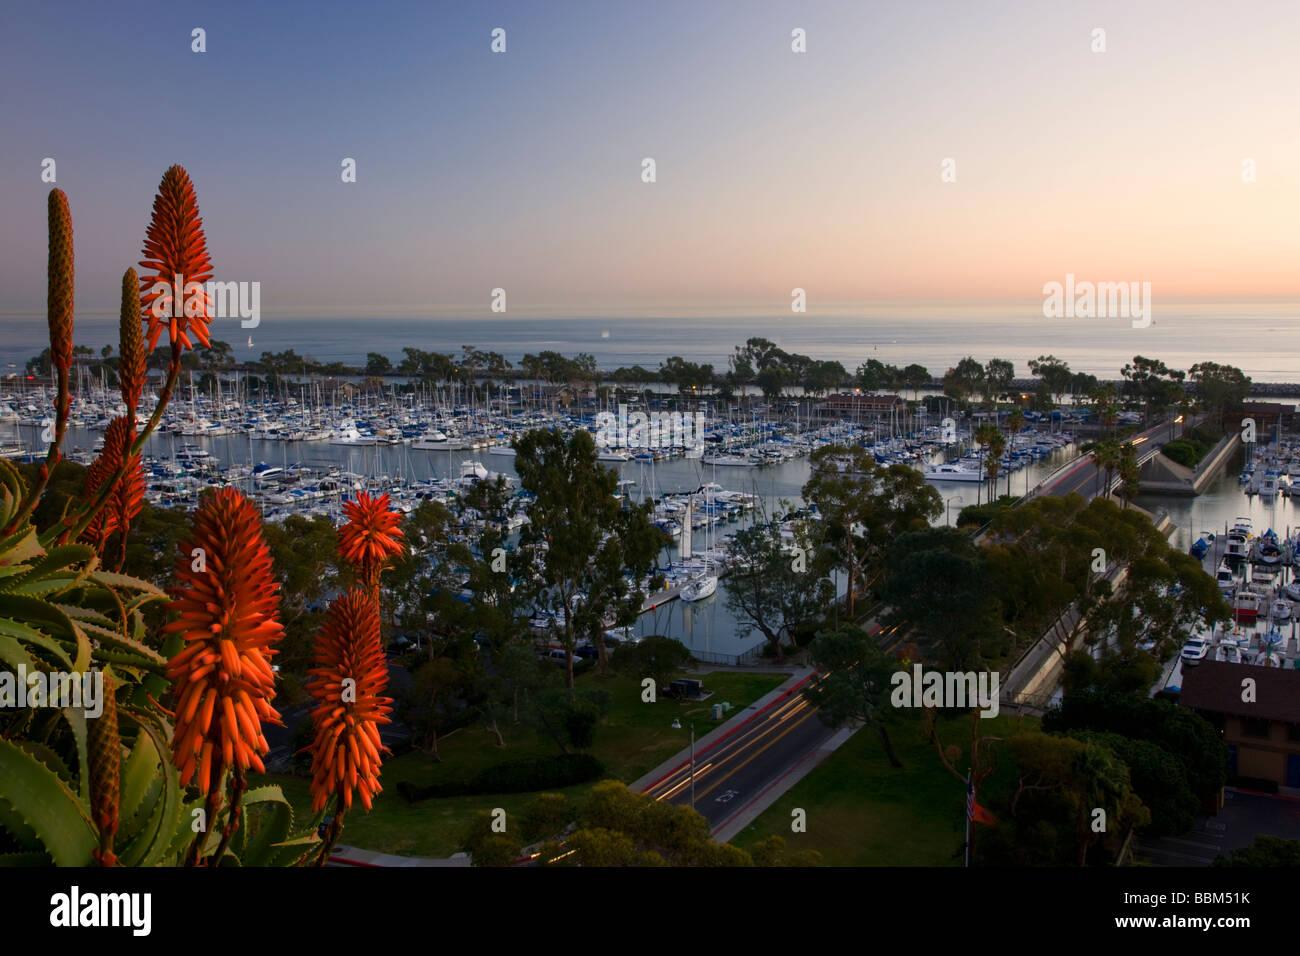 Dana Point Harbor Dana Point Orange County California - Stock Image